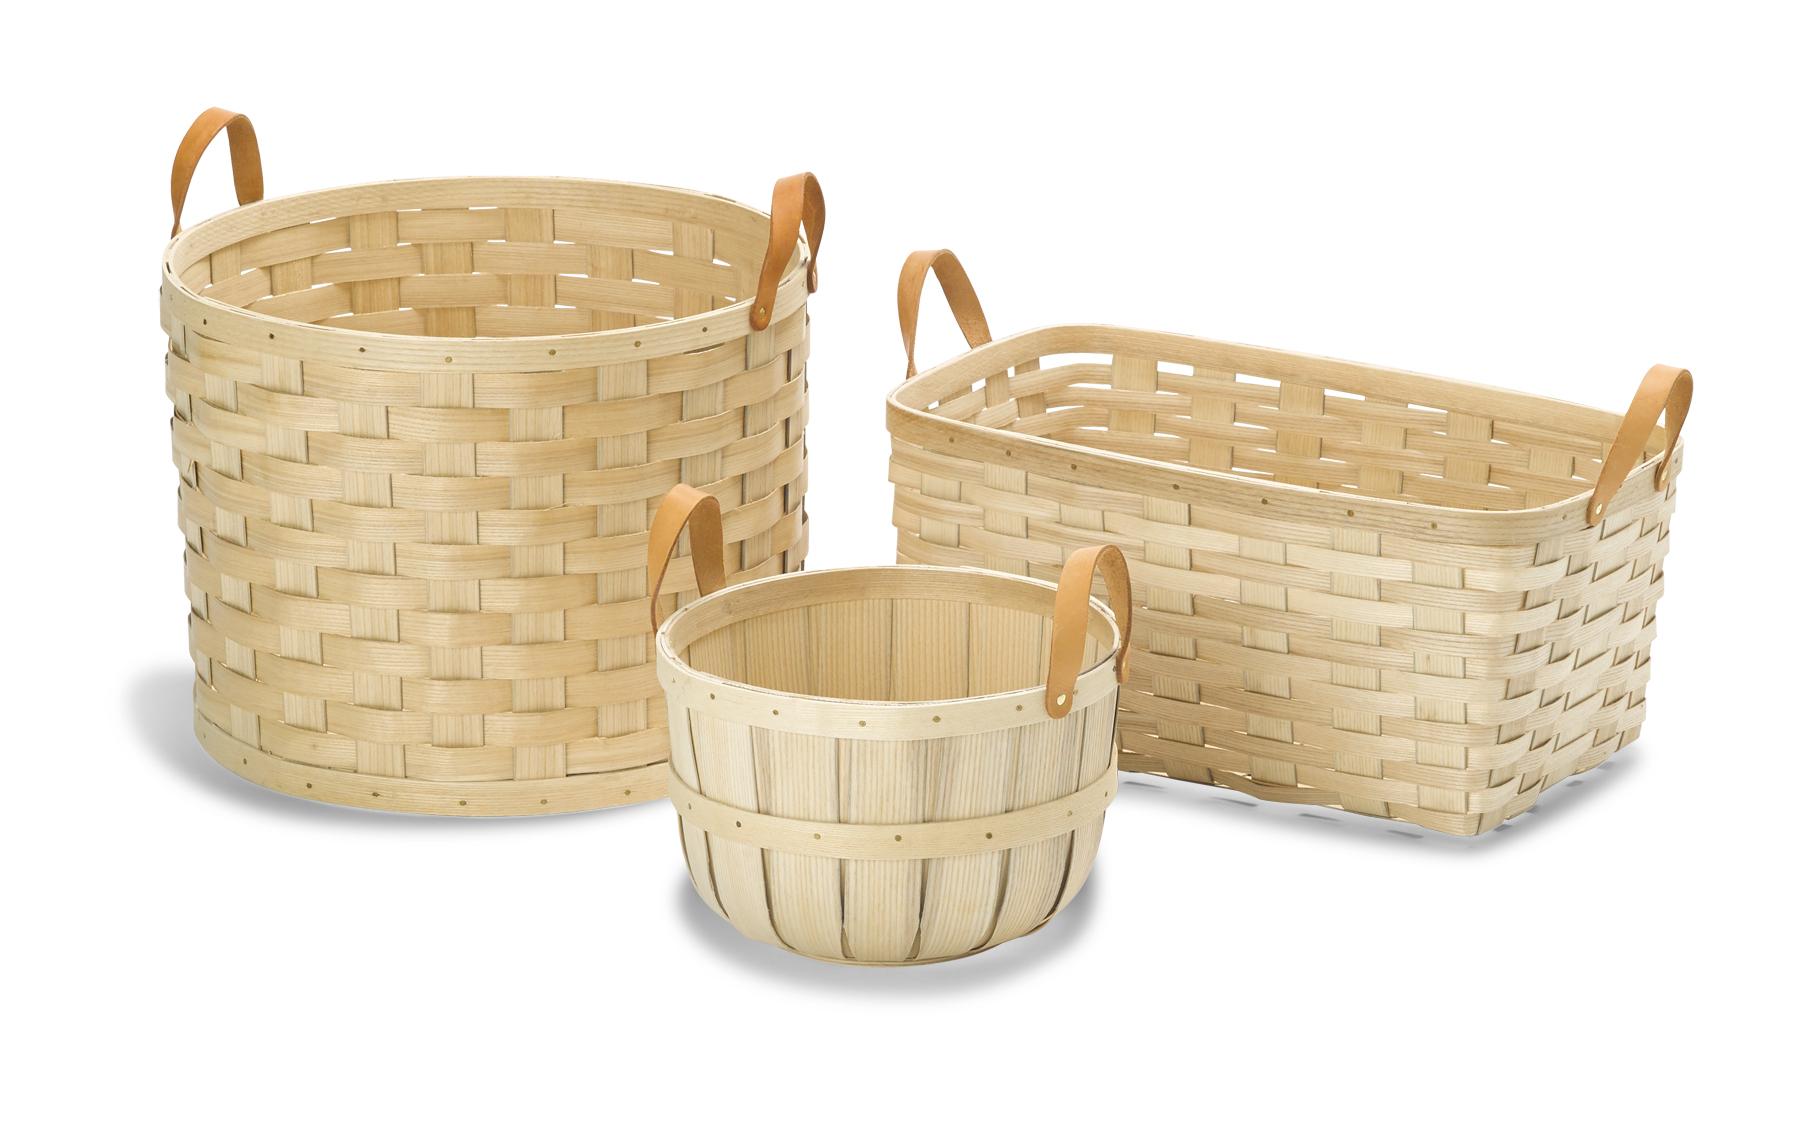 Peterboro-Baskets_Kitchen_Baskets---Group-Shot.jpg